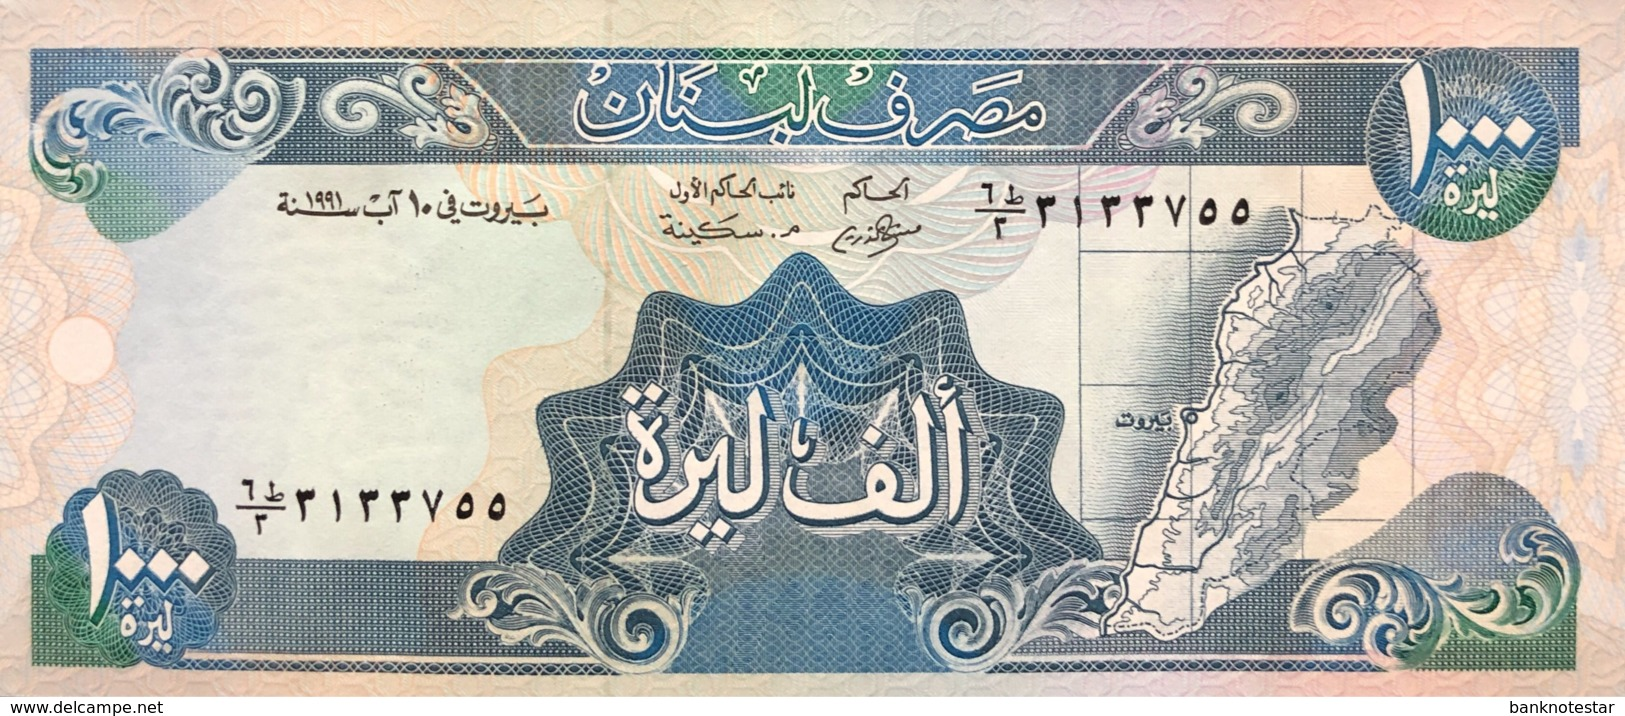 Lebanon 1.000 Livres, P-69b (1991) - UNC - Liban